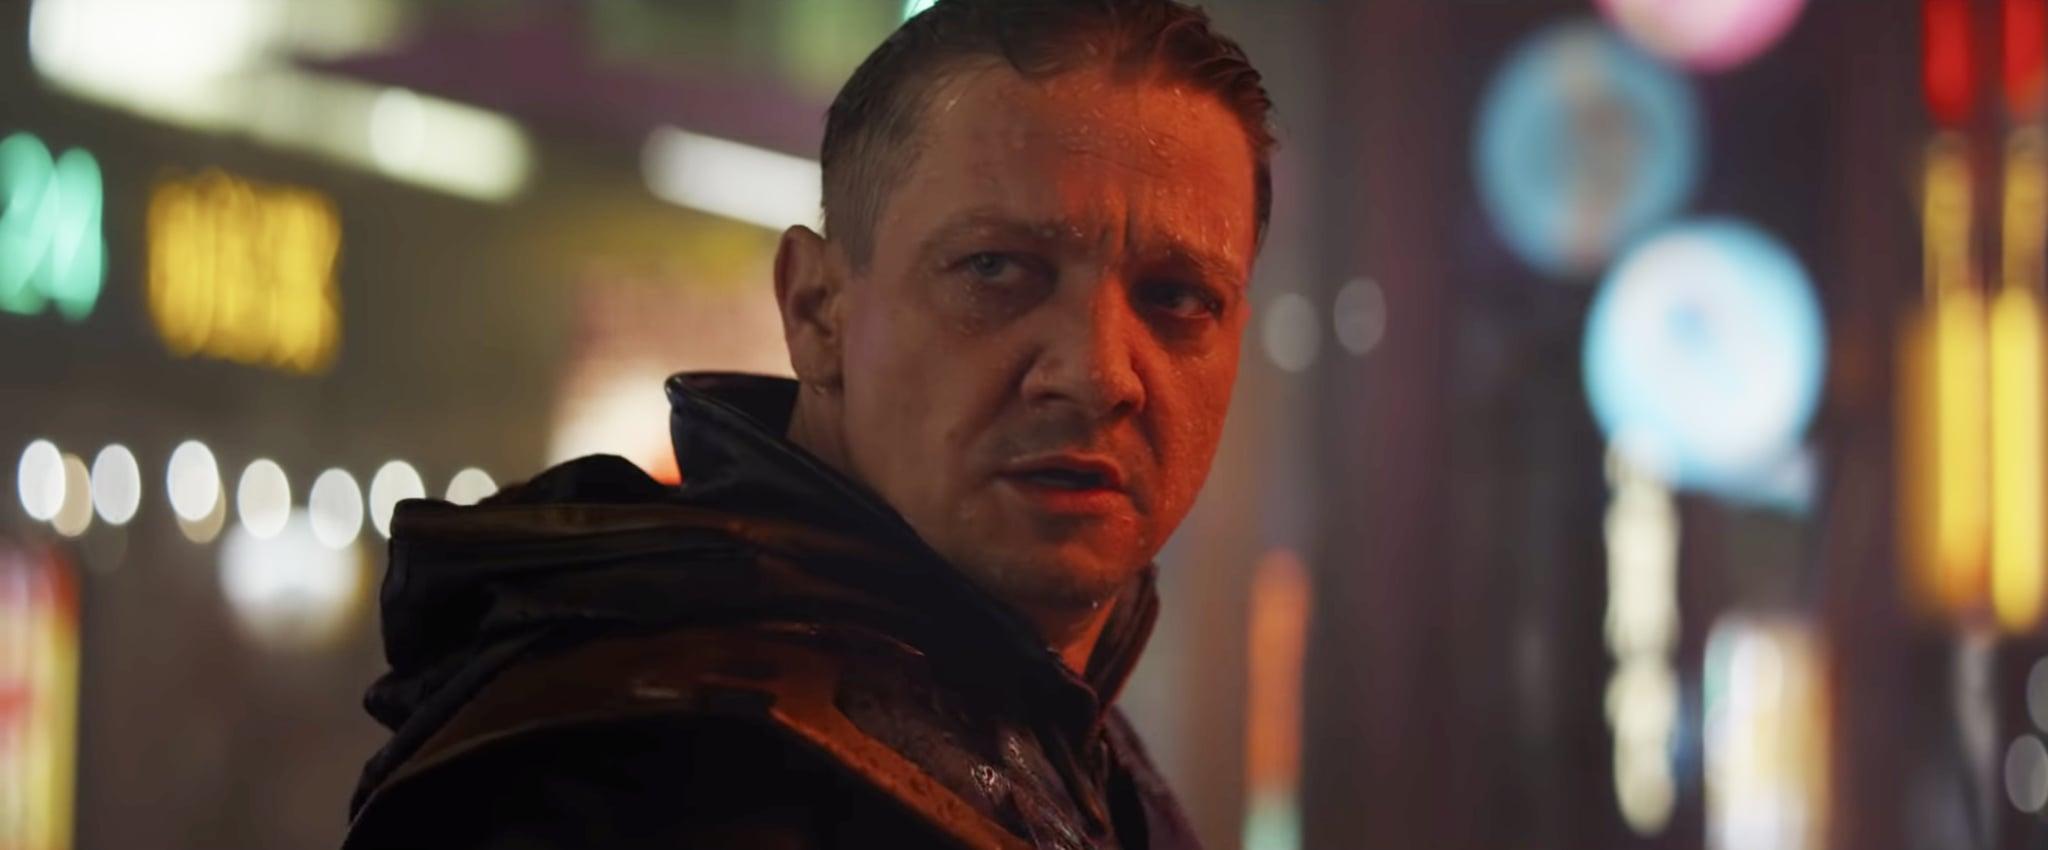 Avengers 4 Ratsel Gelost Fan Findet Versteckte Figur Im Aktuellen